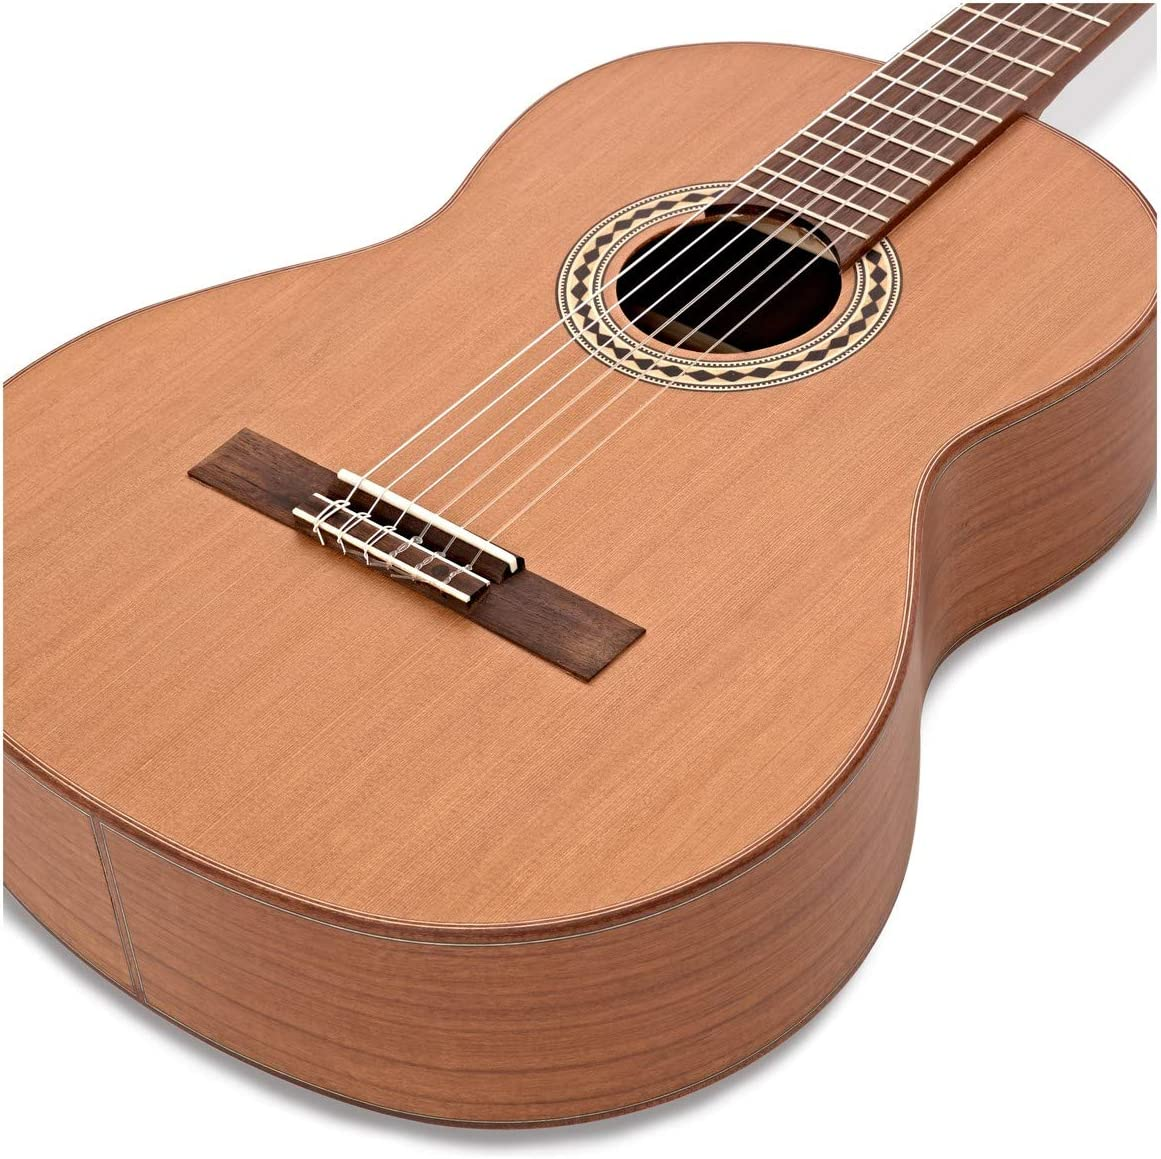 Guitarra Clasica de Doble Tapa Hartwood Libretto: Amazon.es ...